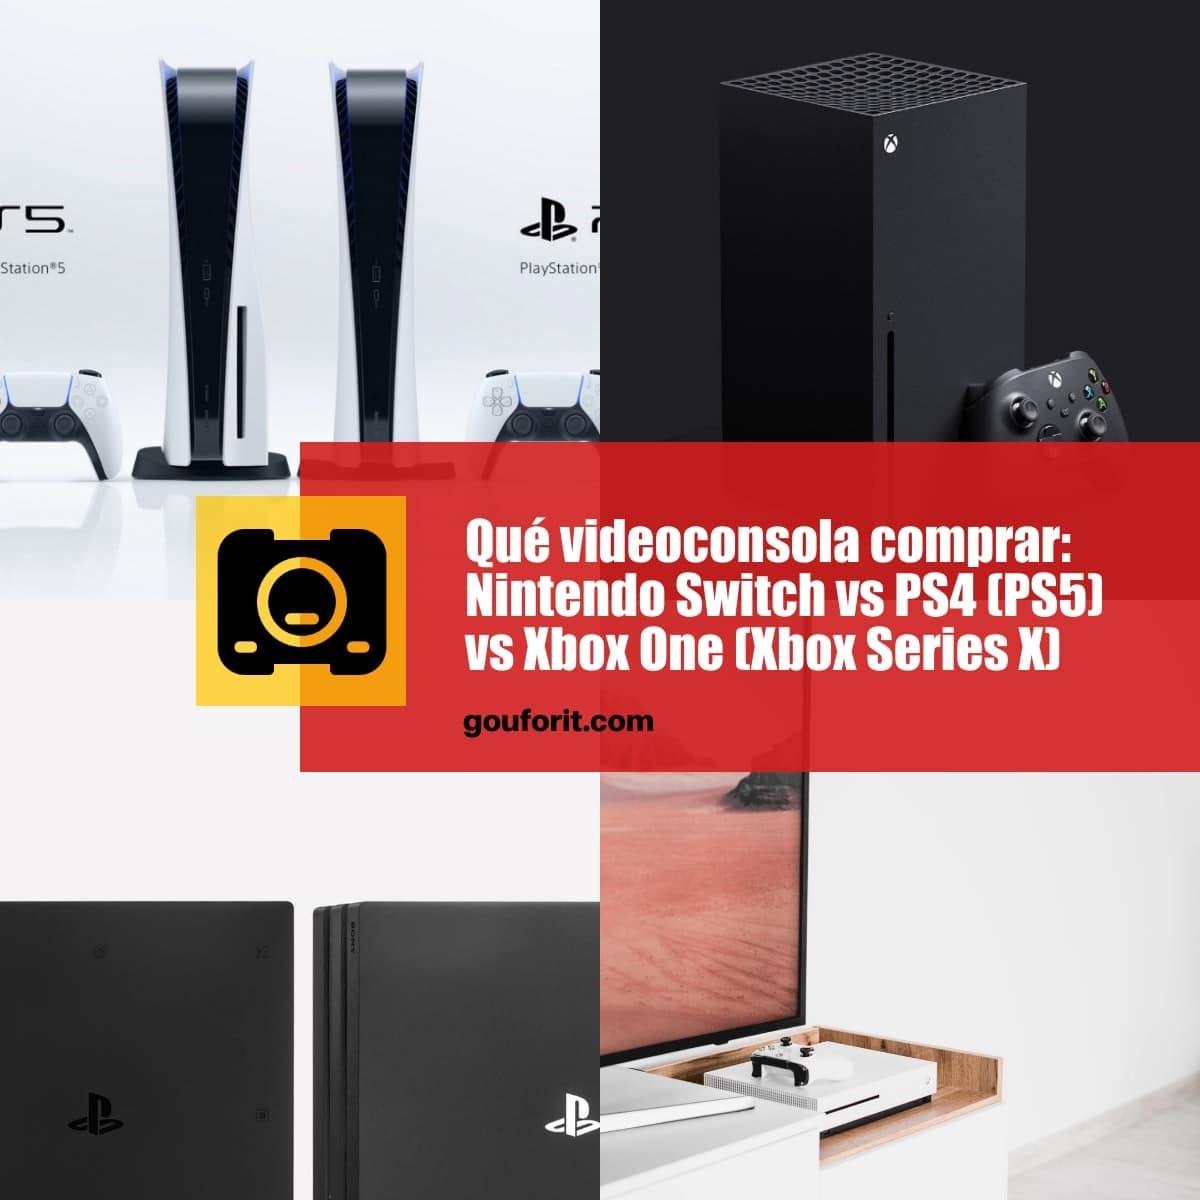 Qué videoconsola comprar: Nintendo Switch vs PS4 (PS5) vs Xbox One (Xbox Series X)